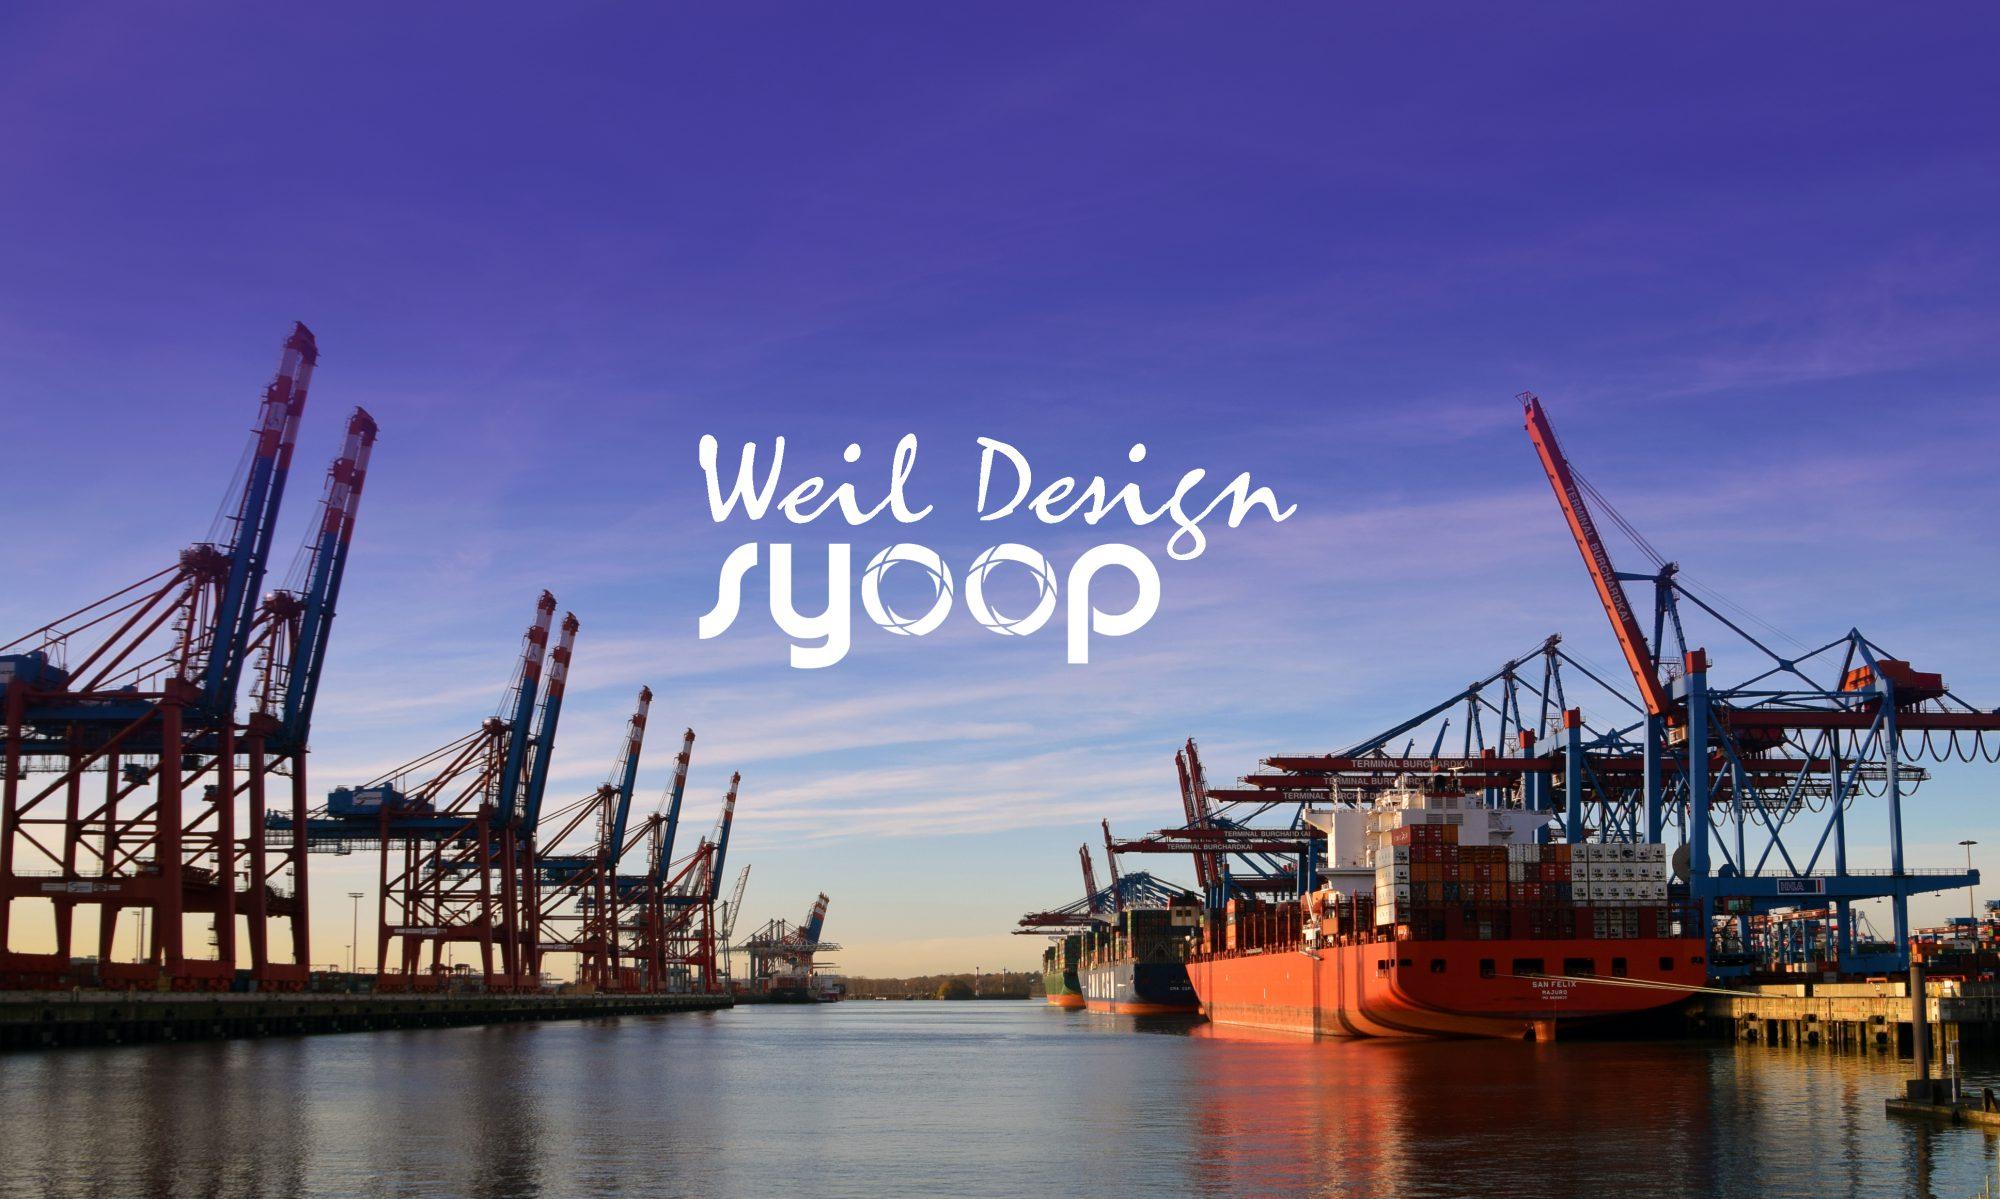 Syoop Filter